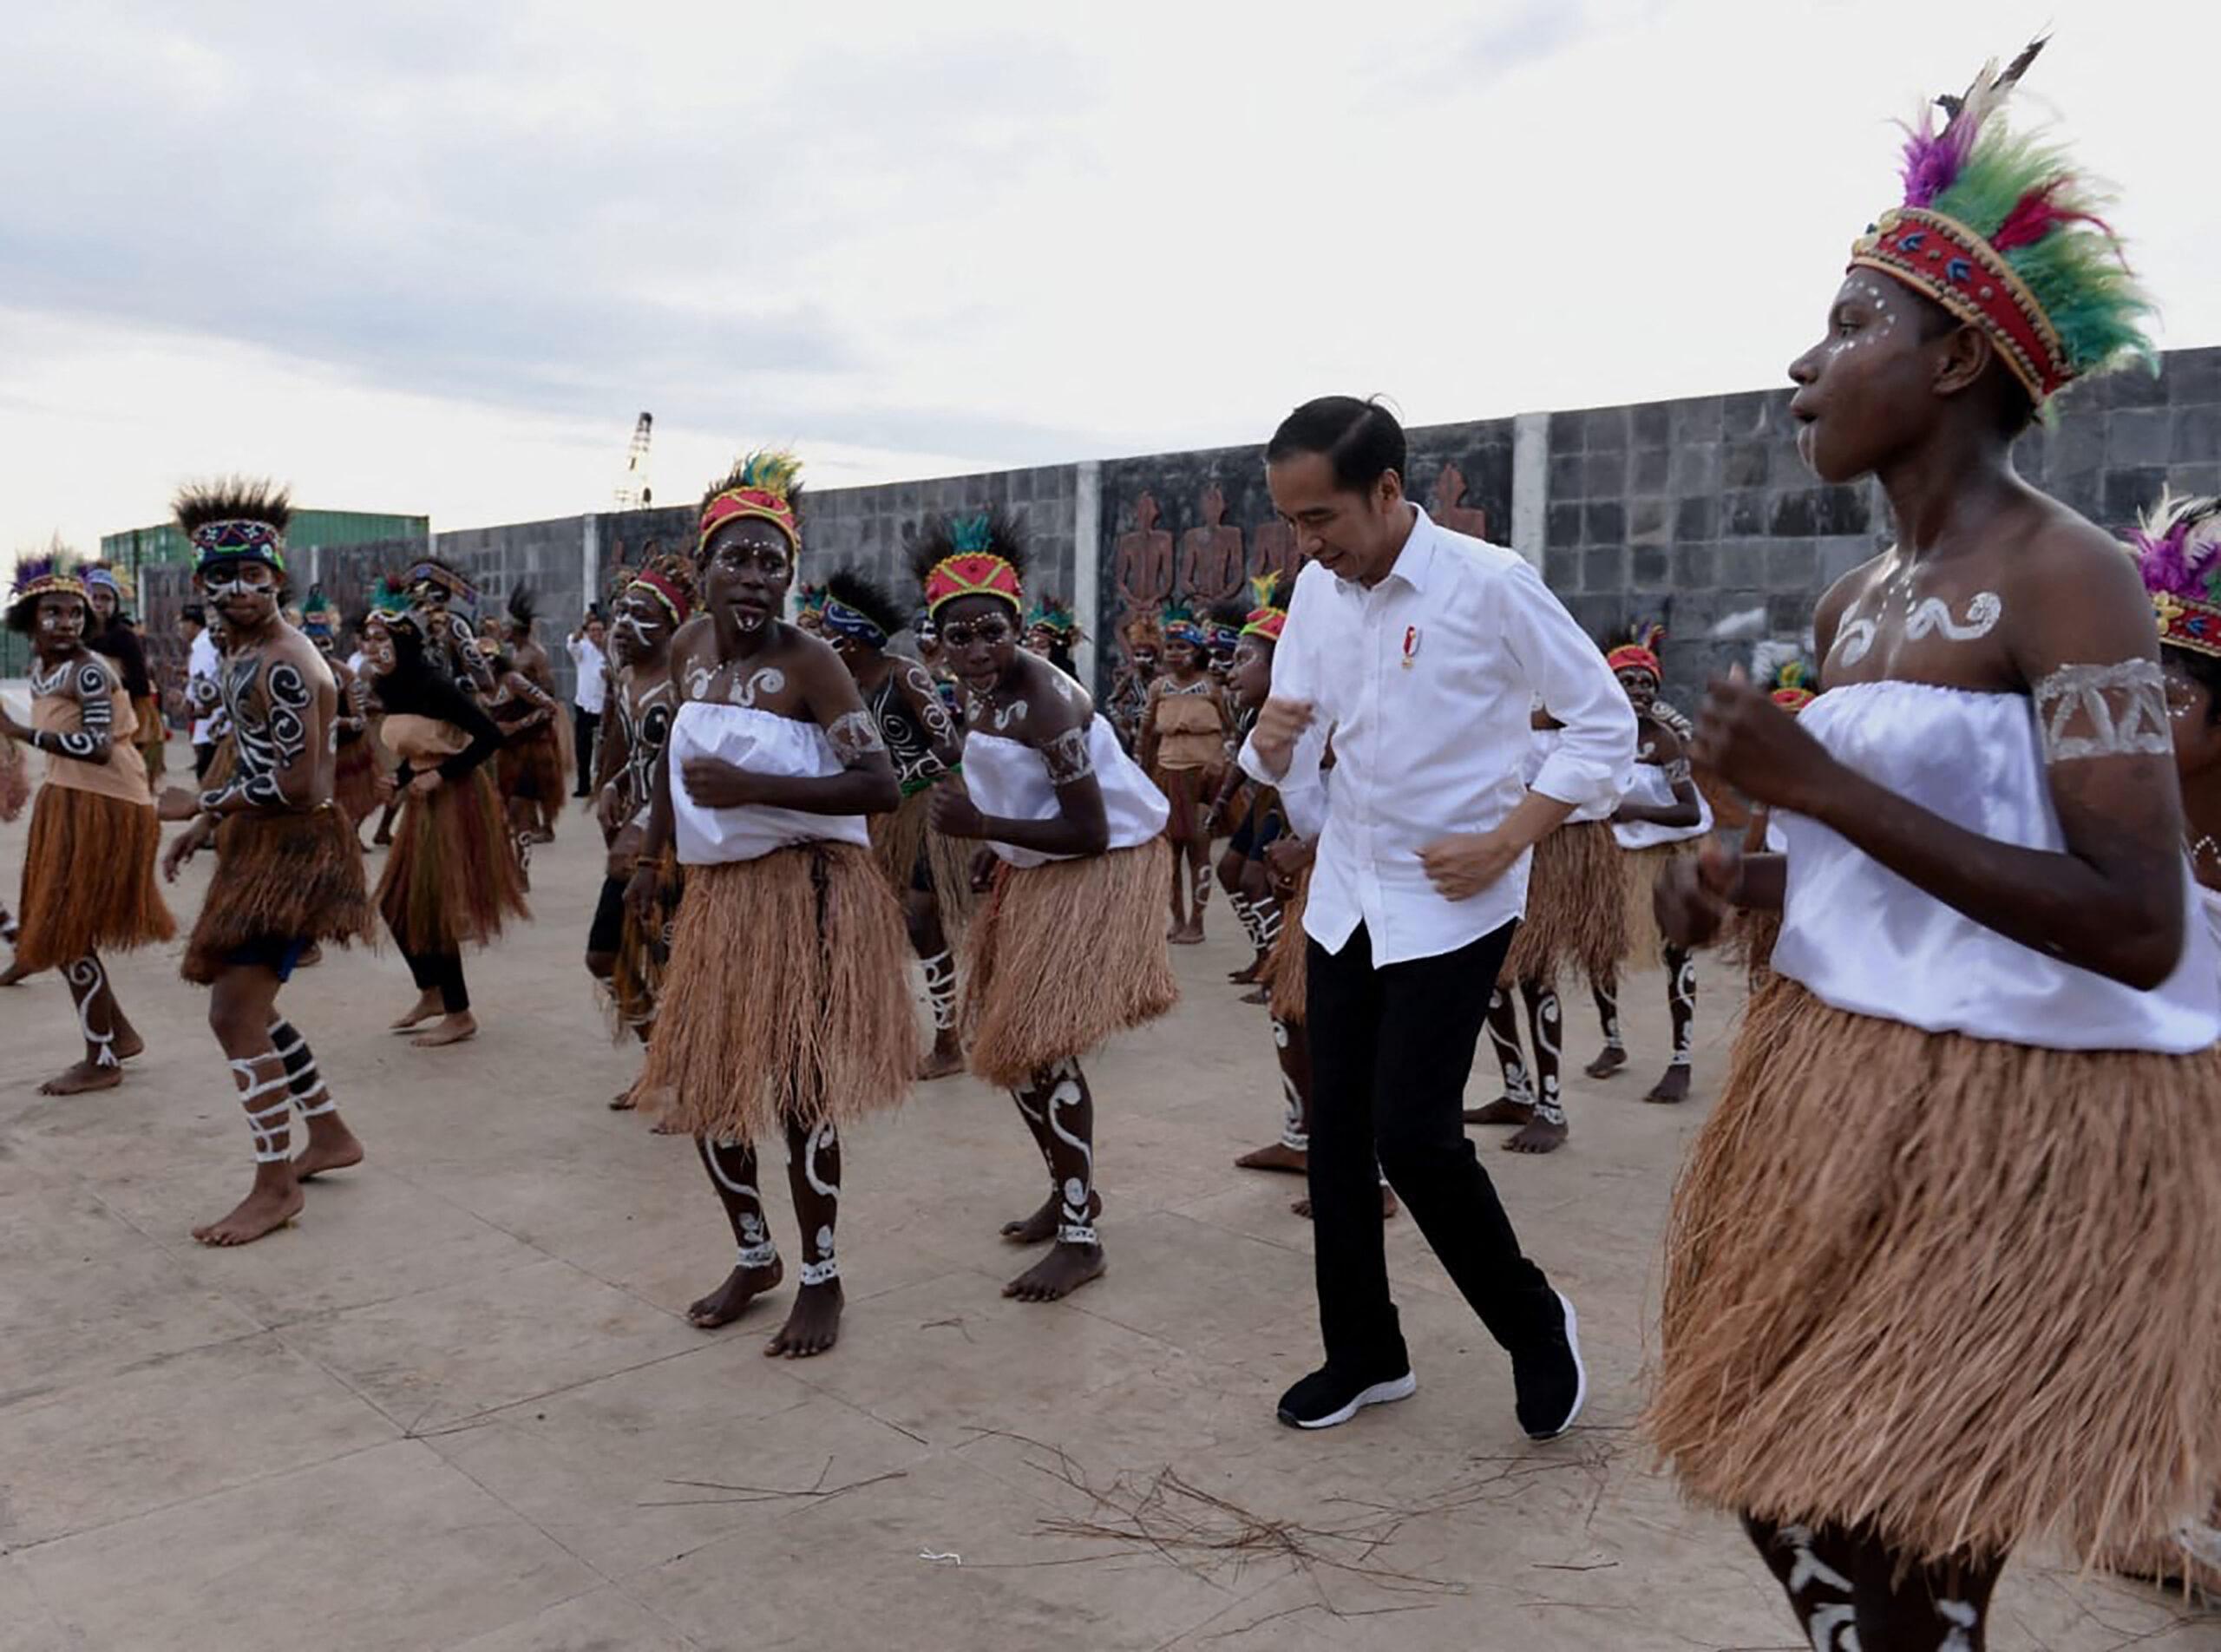 Jokowi's Papua strategy: Development above all else?